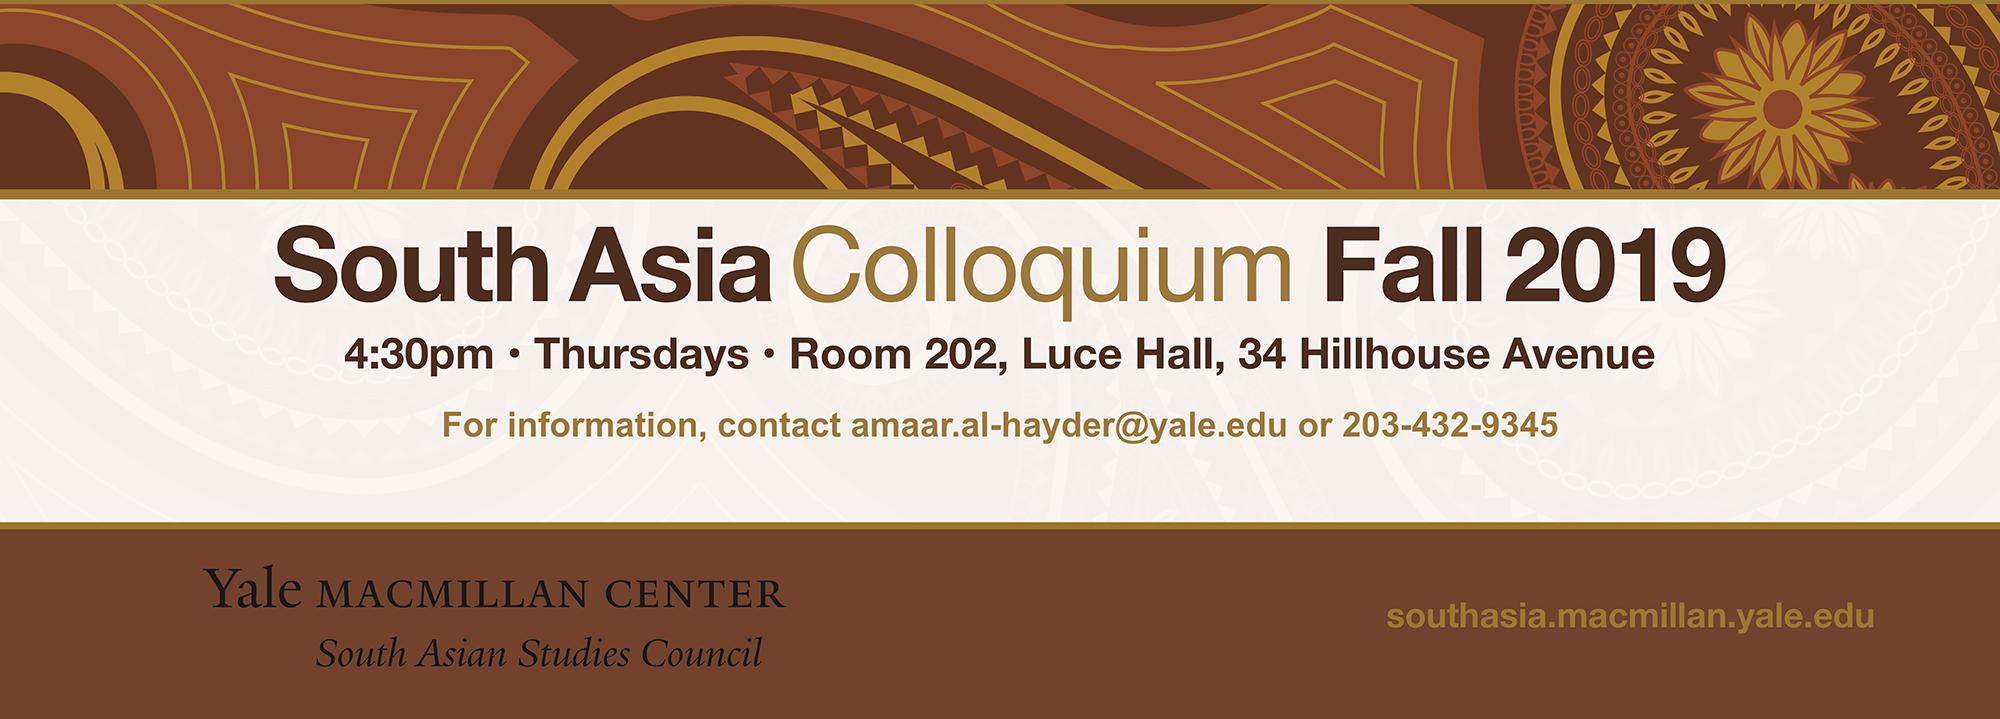 South Asia Colloquium Fall 2019